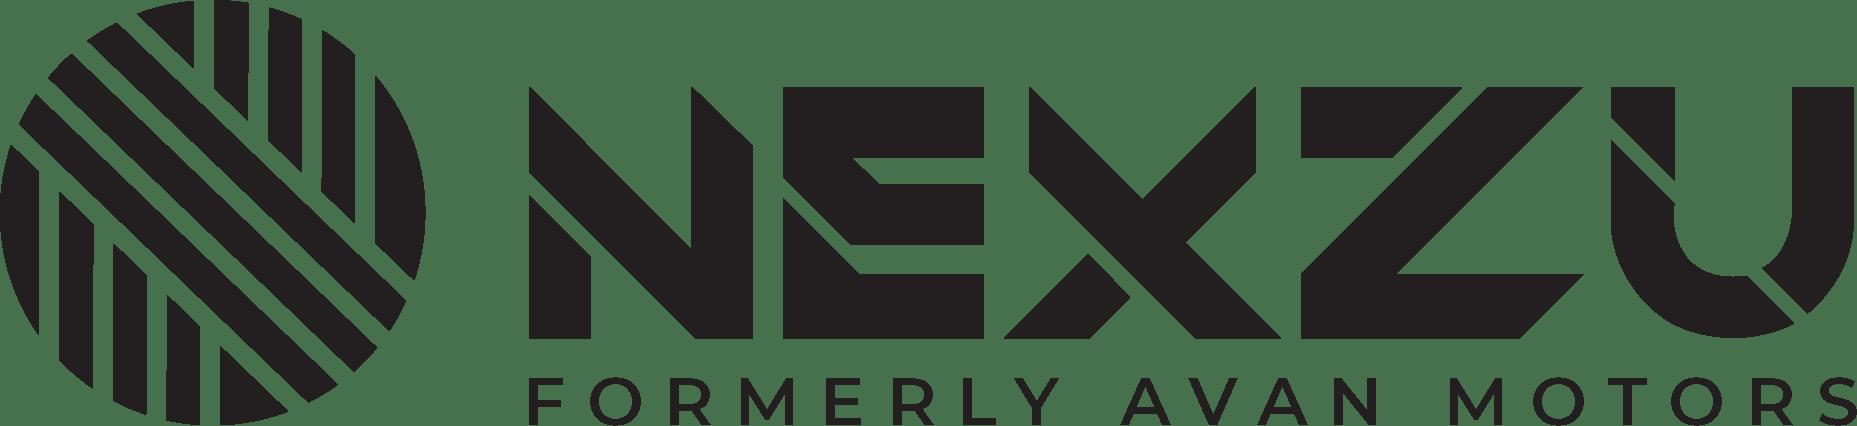 Nexzu Logo